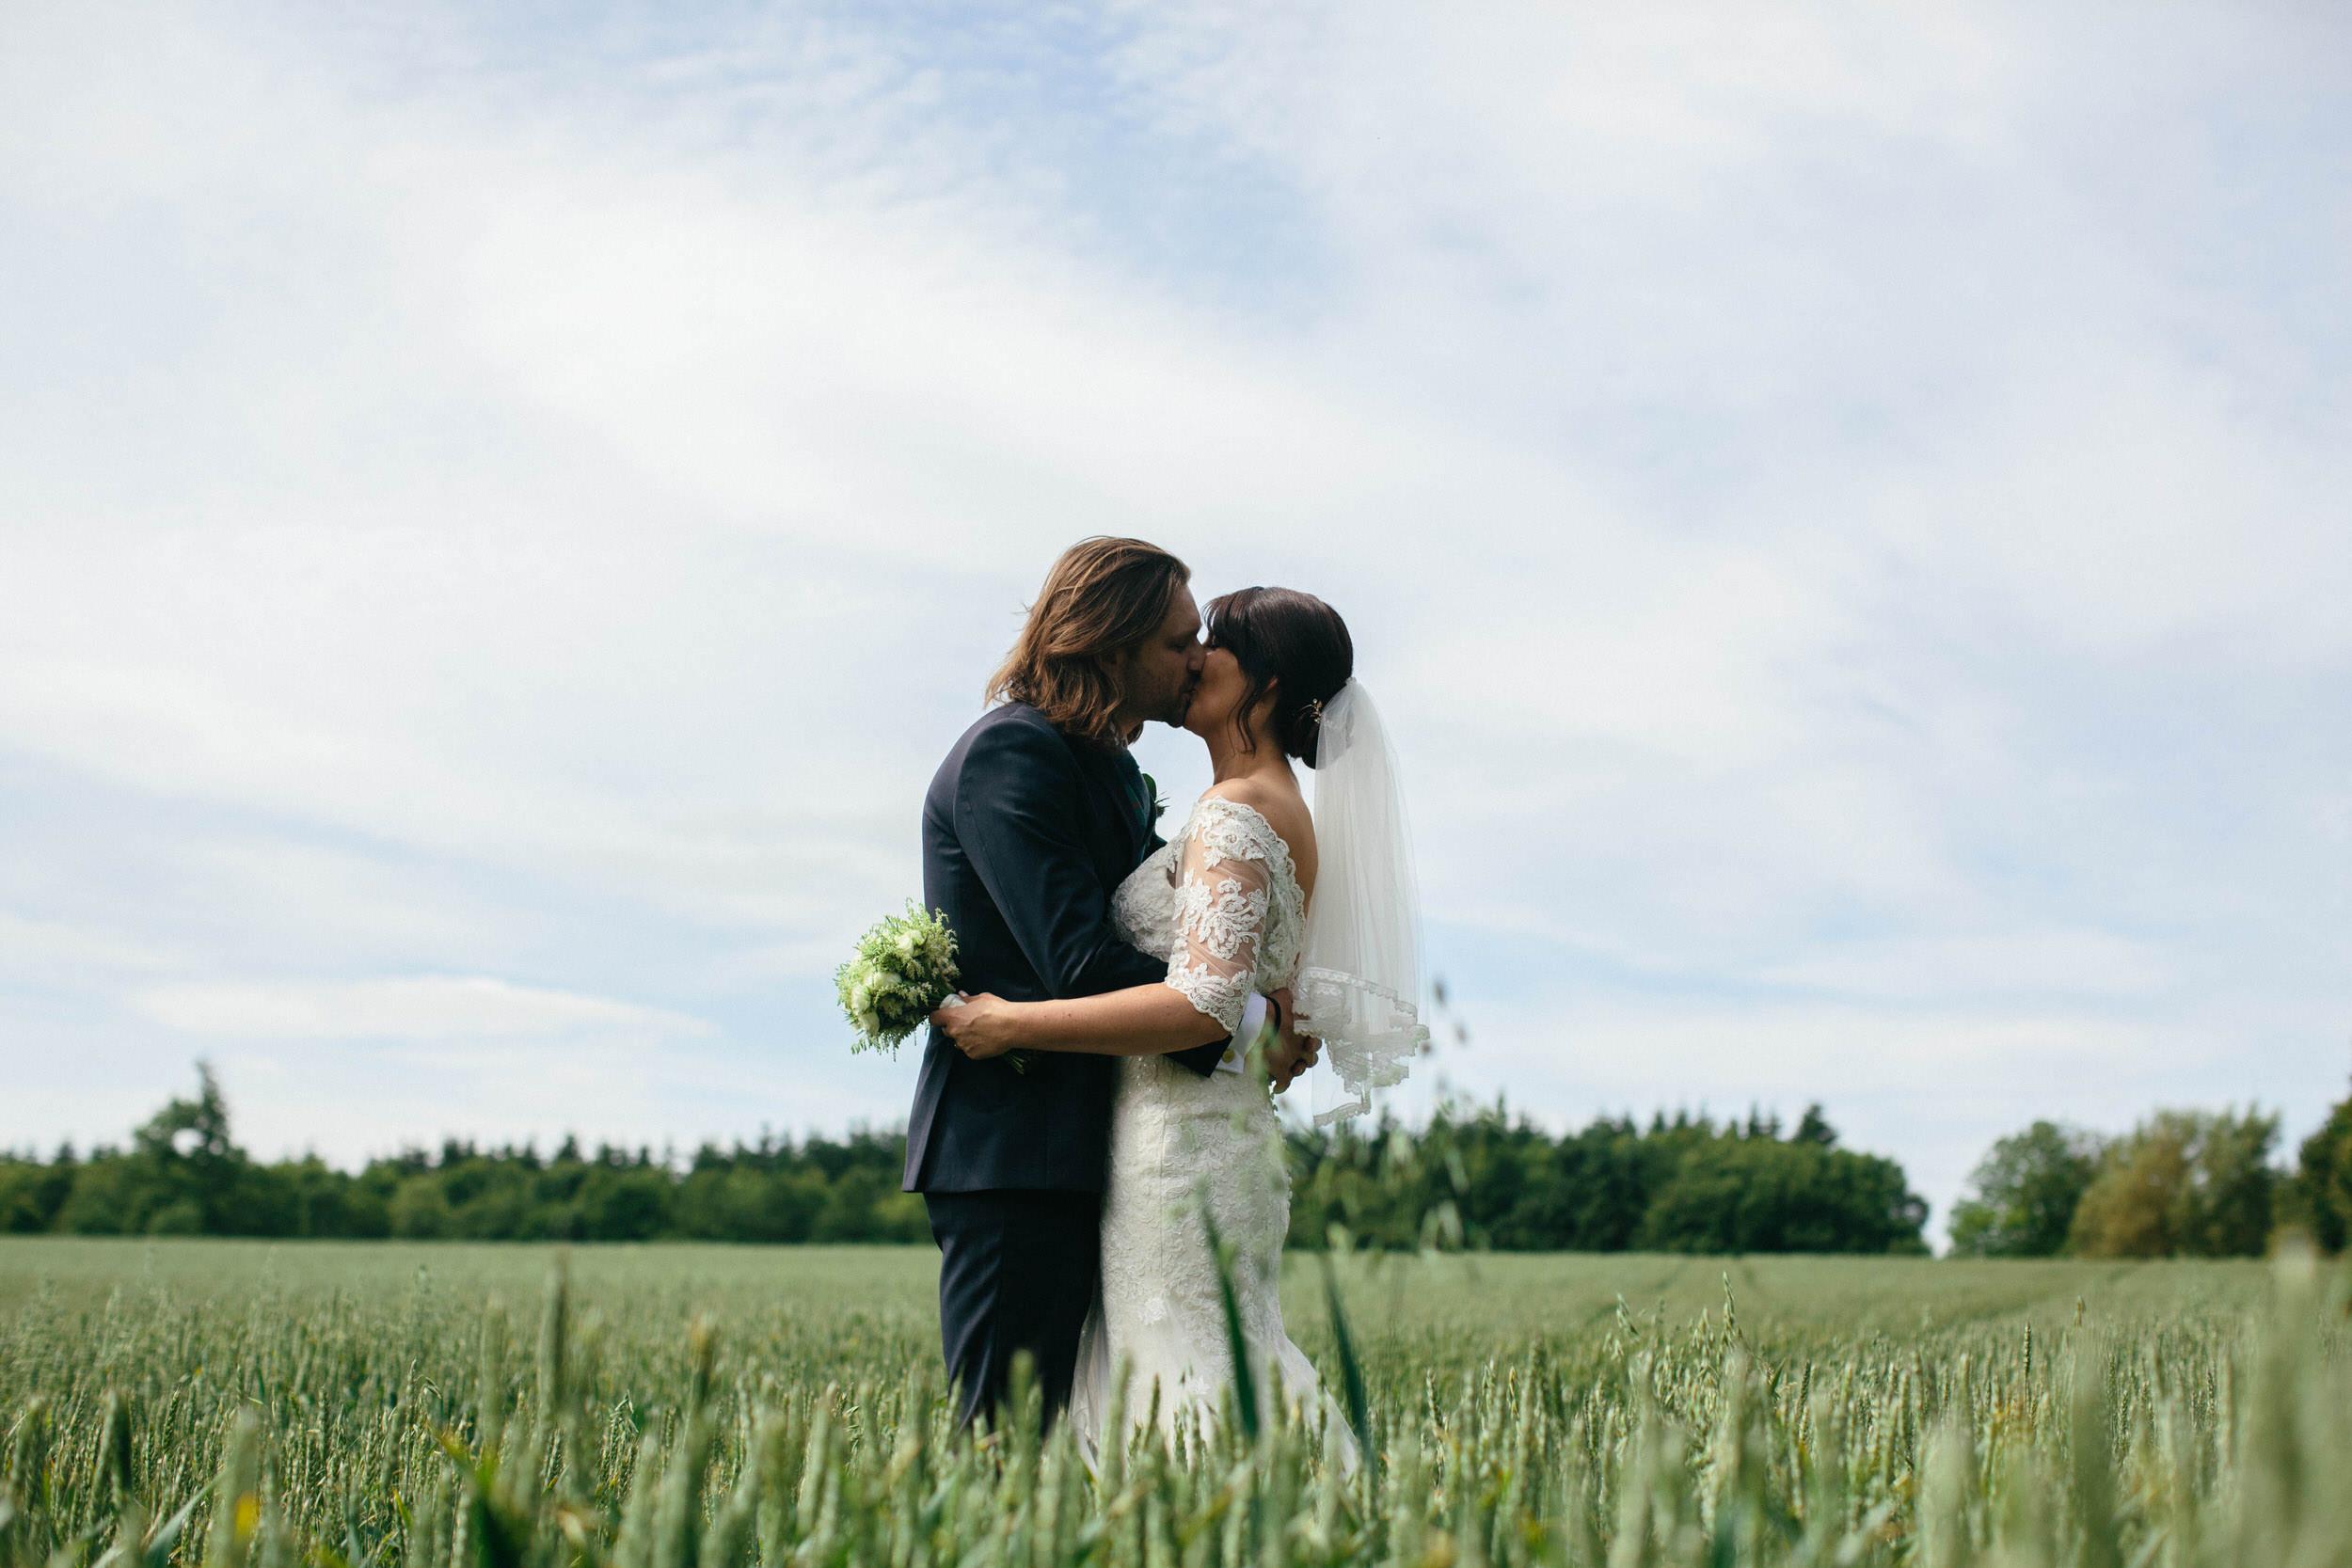 Quirky Wedding Photographer Scotland Glasgow Edinburgh Mirrorbox 102.jpg